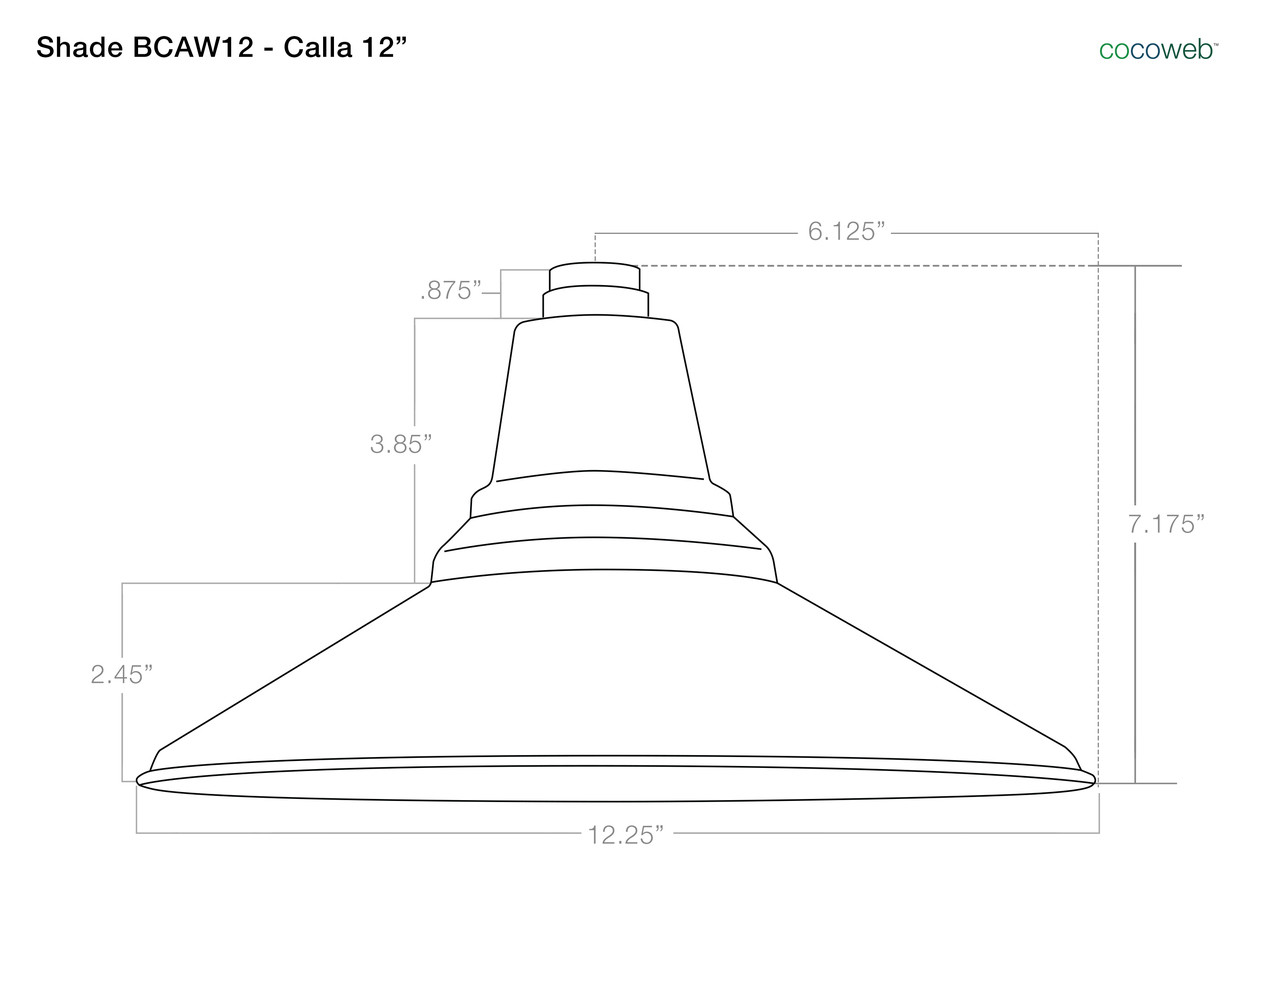 12 Calla Led High Power Floor Lamp Black Cocoweb Inc Antique Rewire Diagram Shade Dimensions For